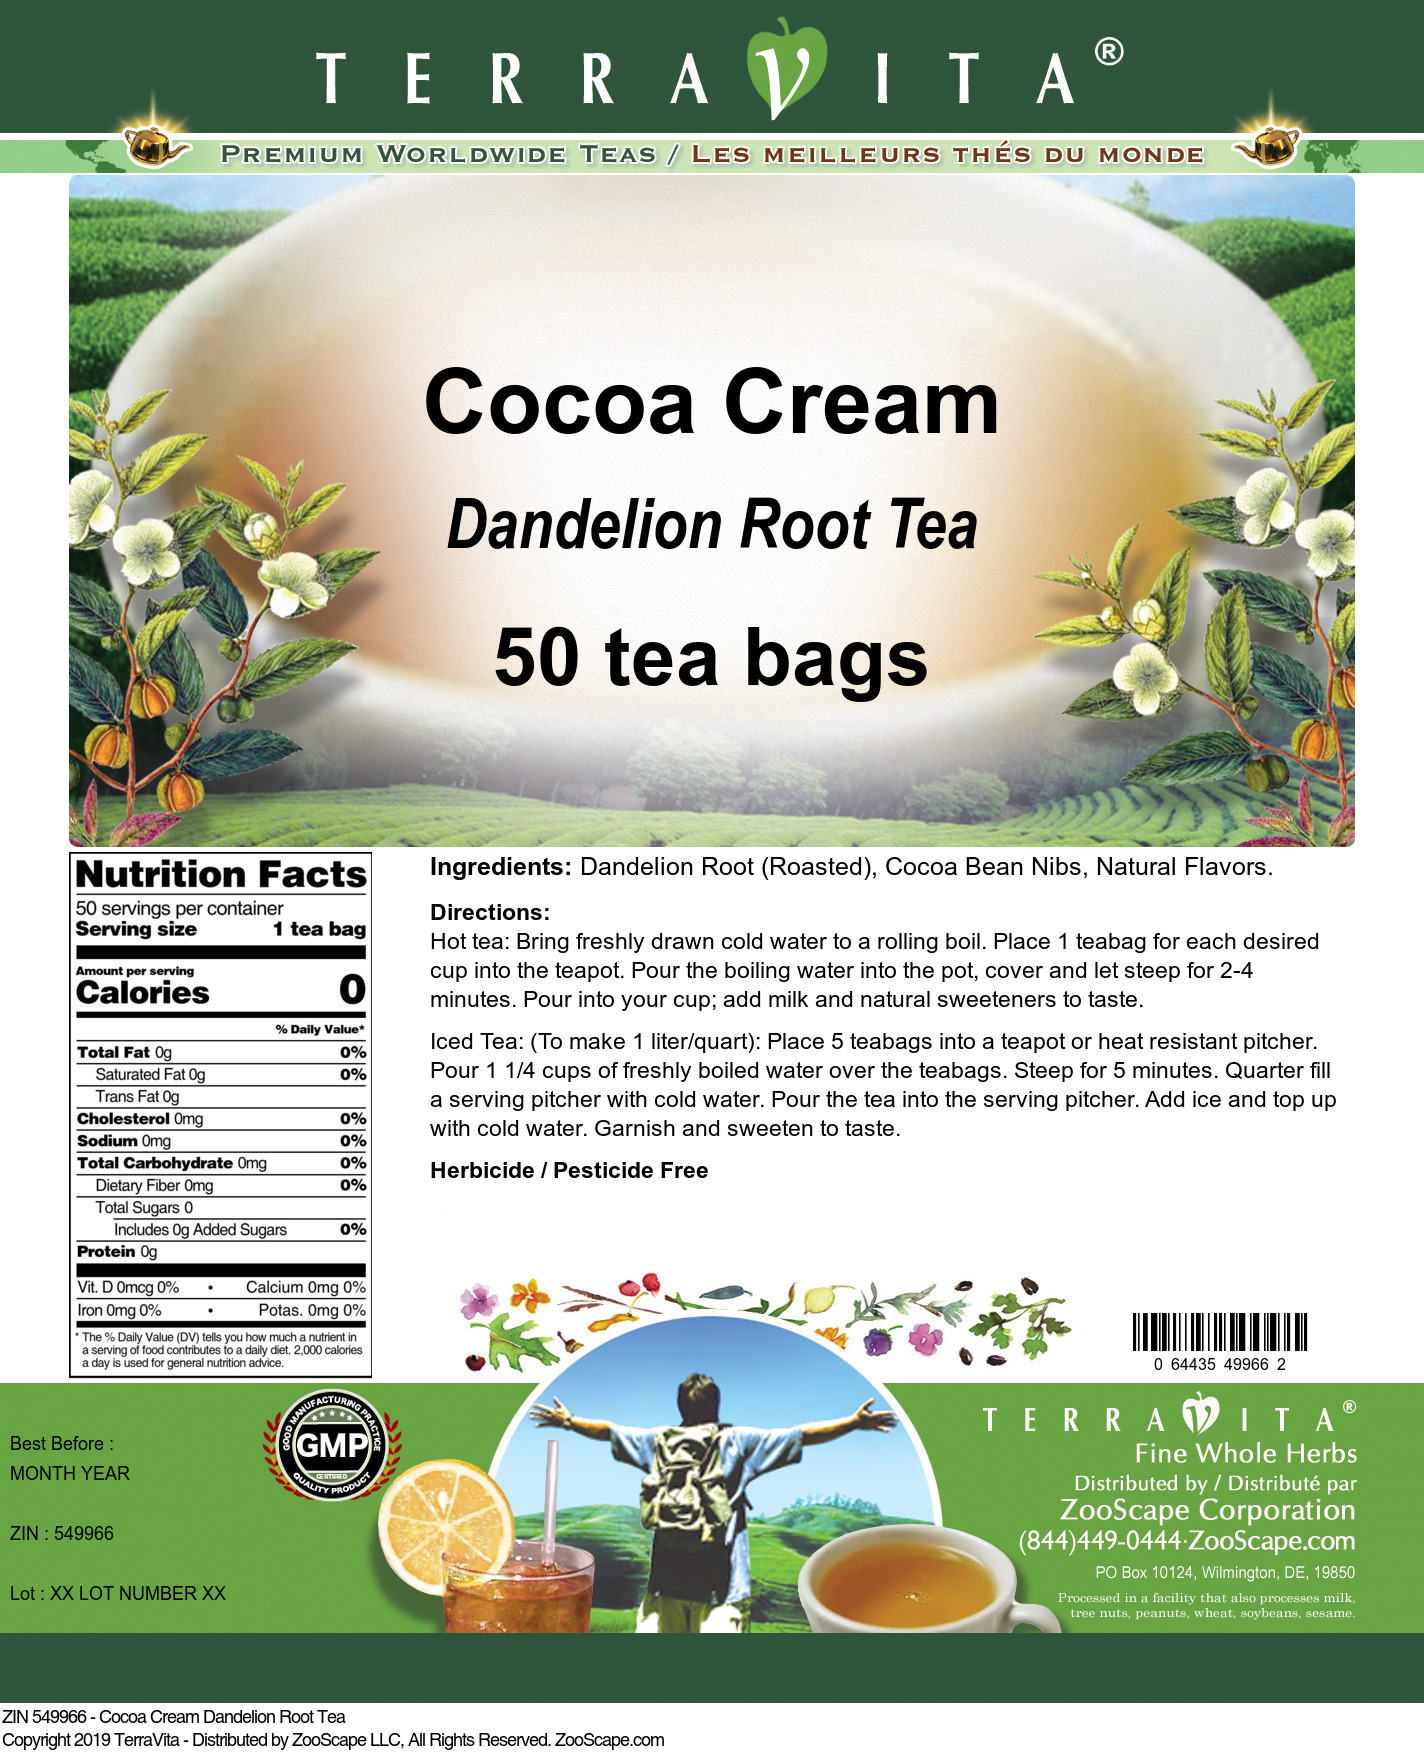 Cocoa Cream Dandelion Root